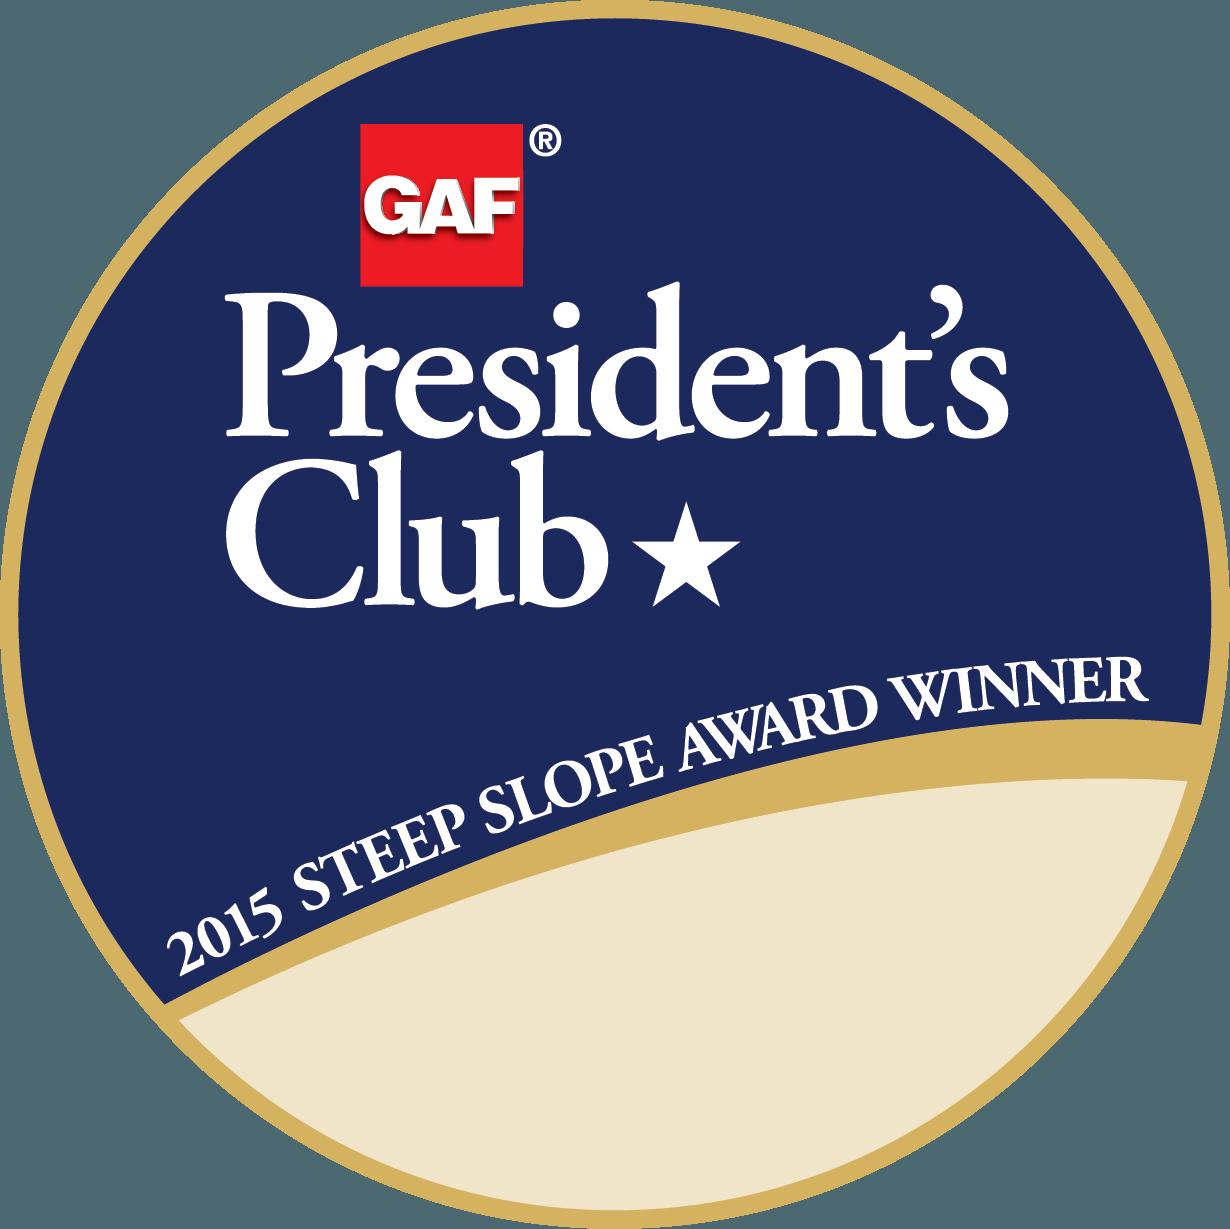 Steep Slope Presidents Club_2015-1 Star